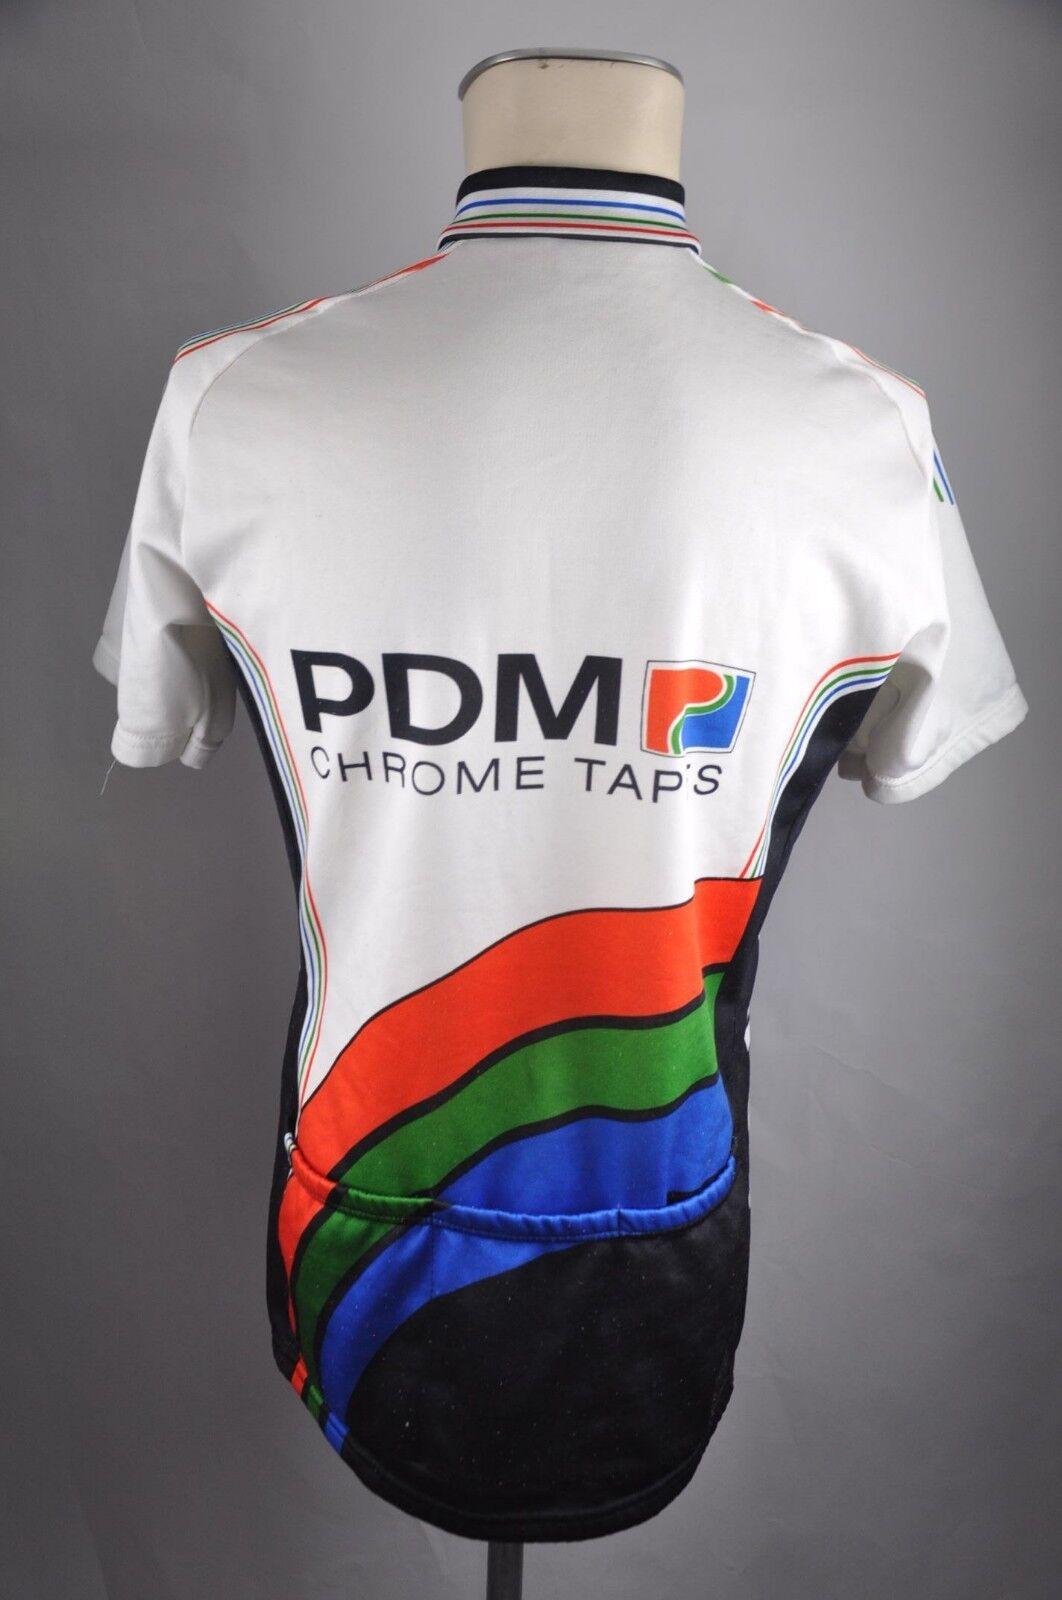 PDM Chrome cintas vintage vintage vintage camiseta talla m-l BW 53cm bike Cycling Jersey camisa hz2 f1e8c3